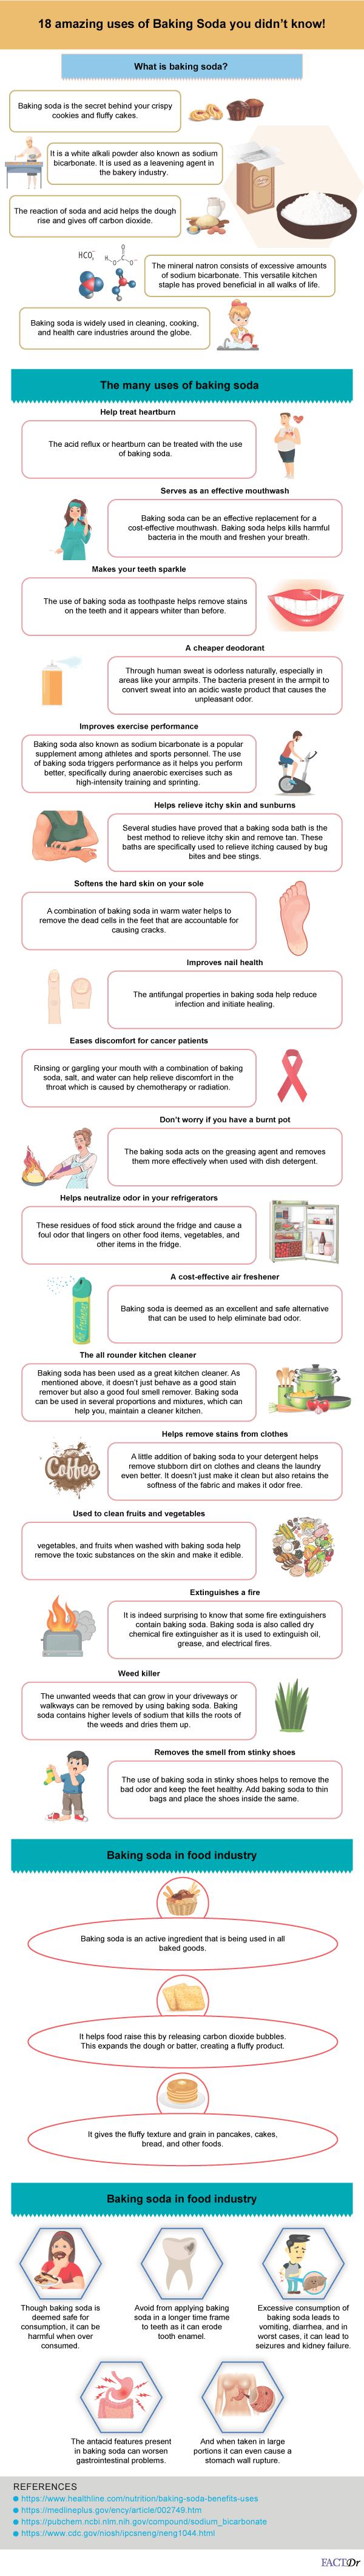 baking soda uses infographic